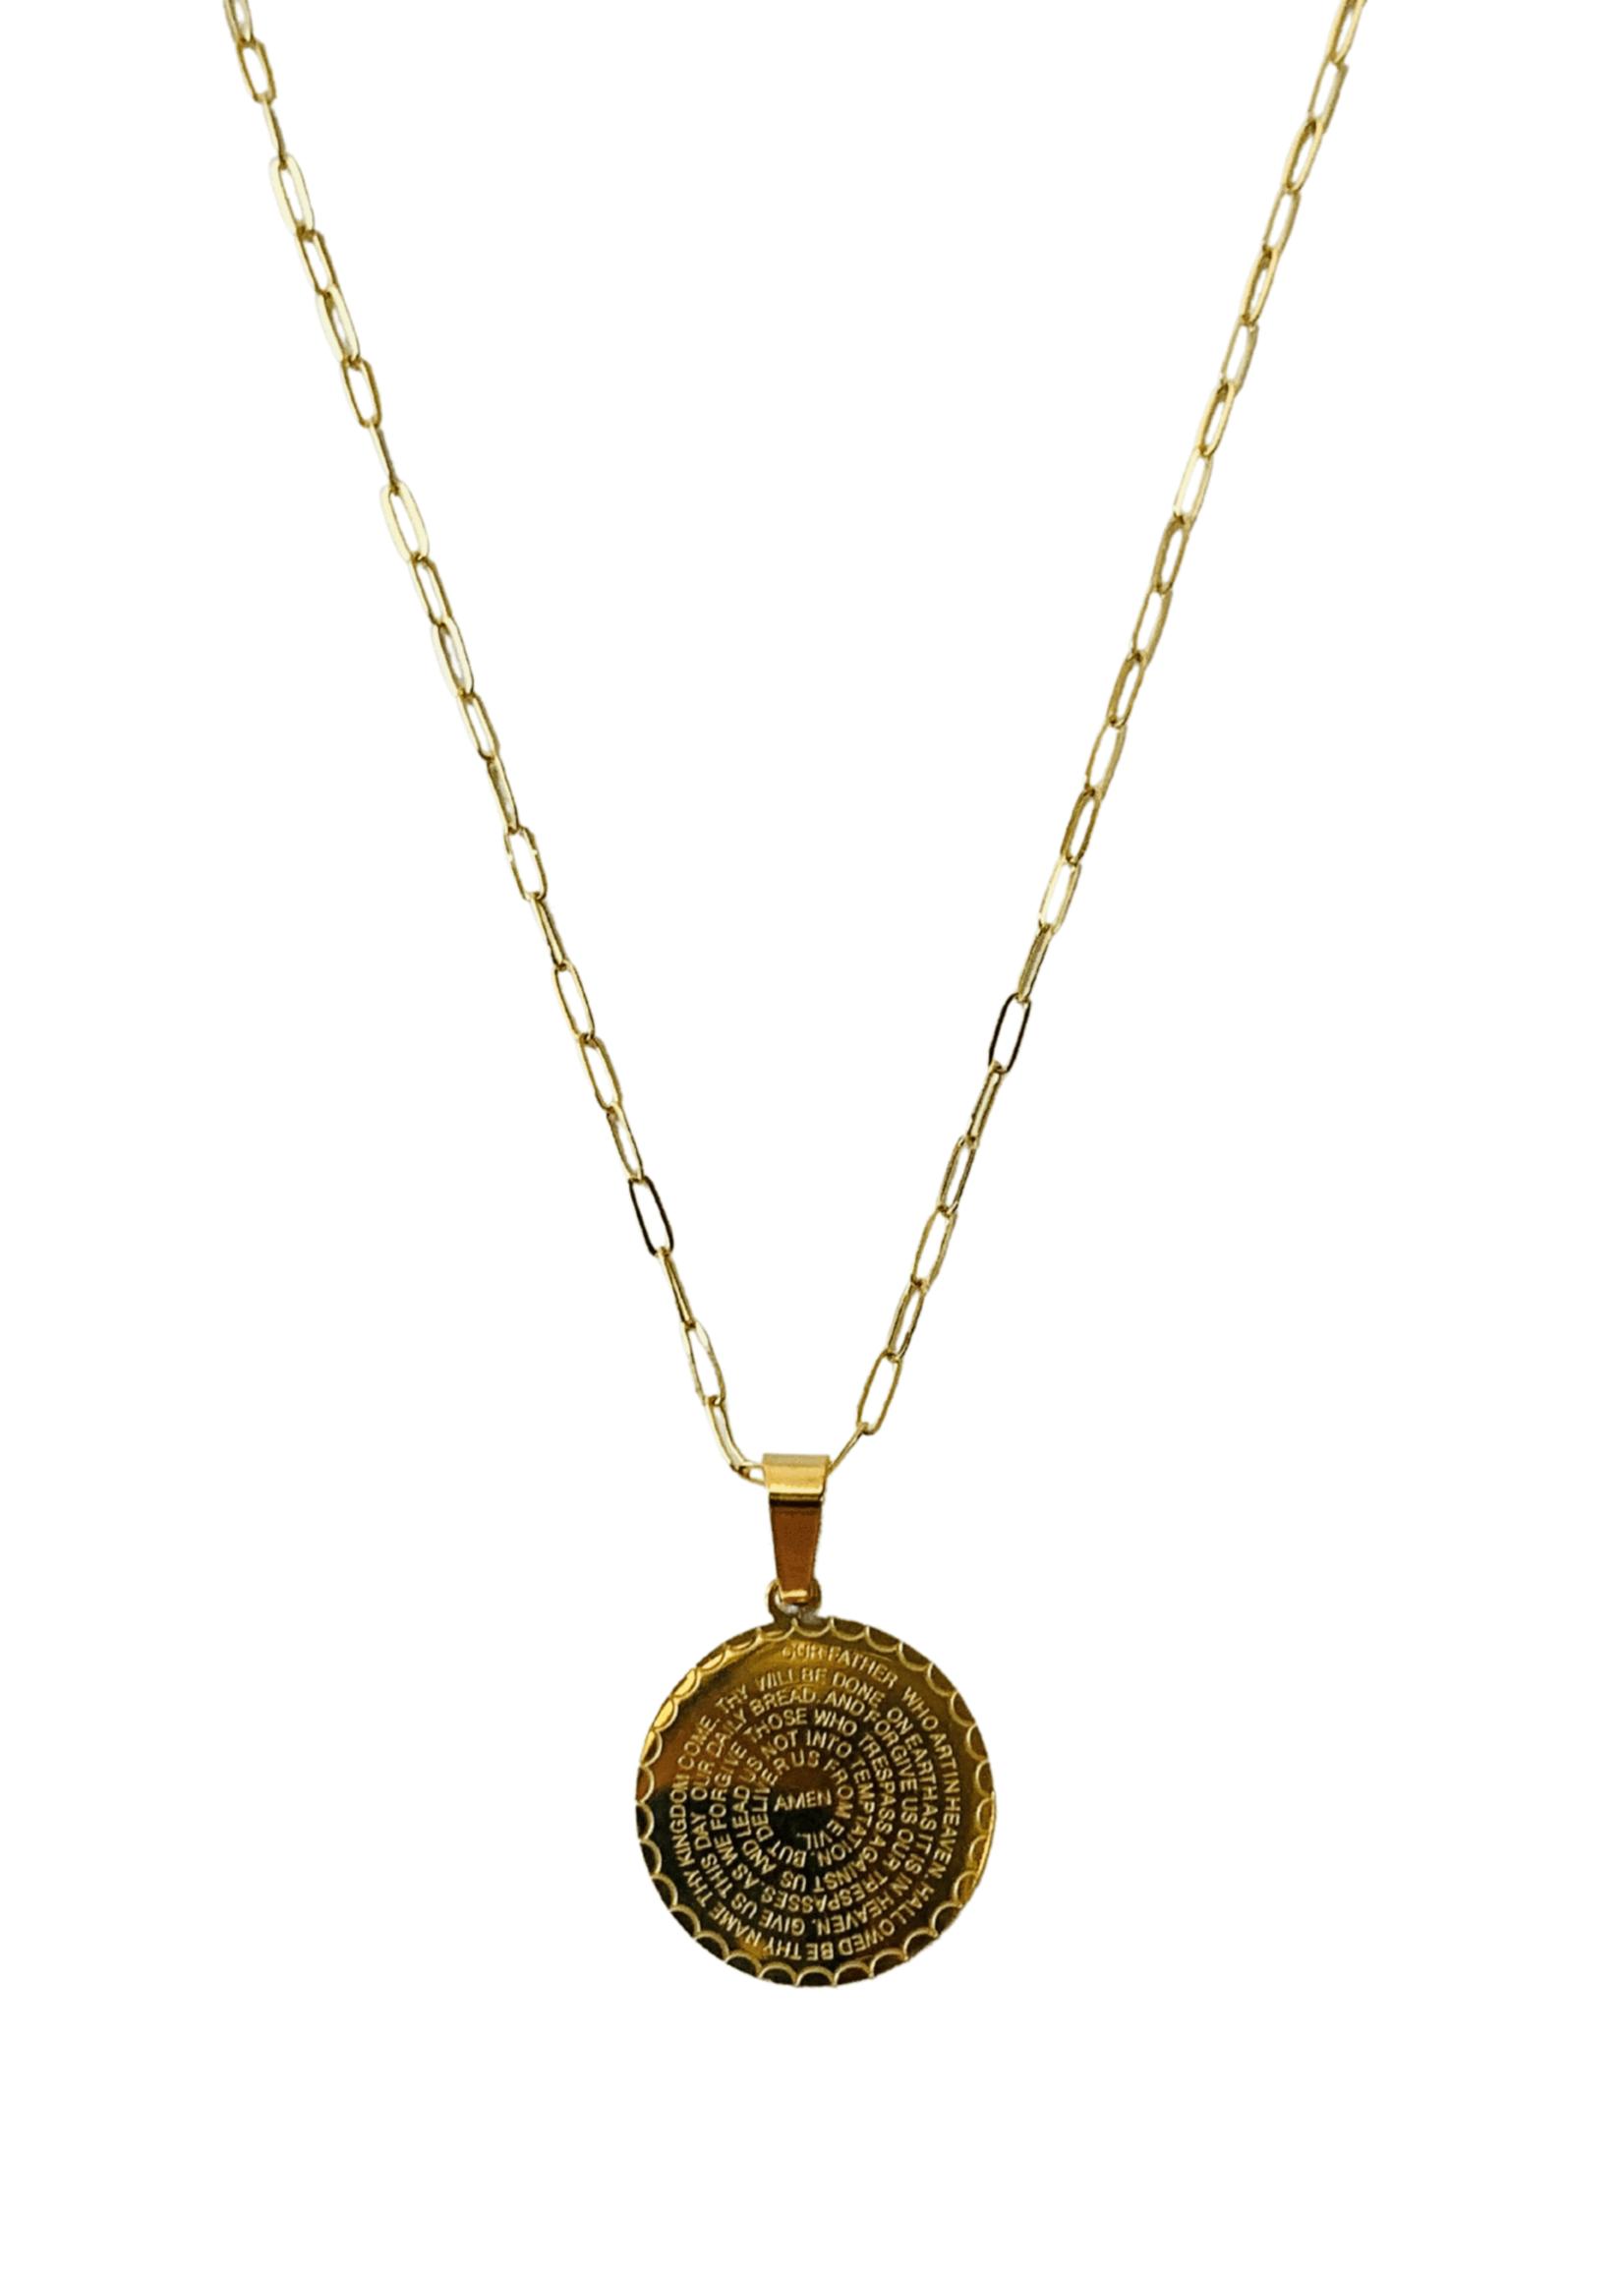 Allison Avery Lord's Prayer Necklace